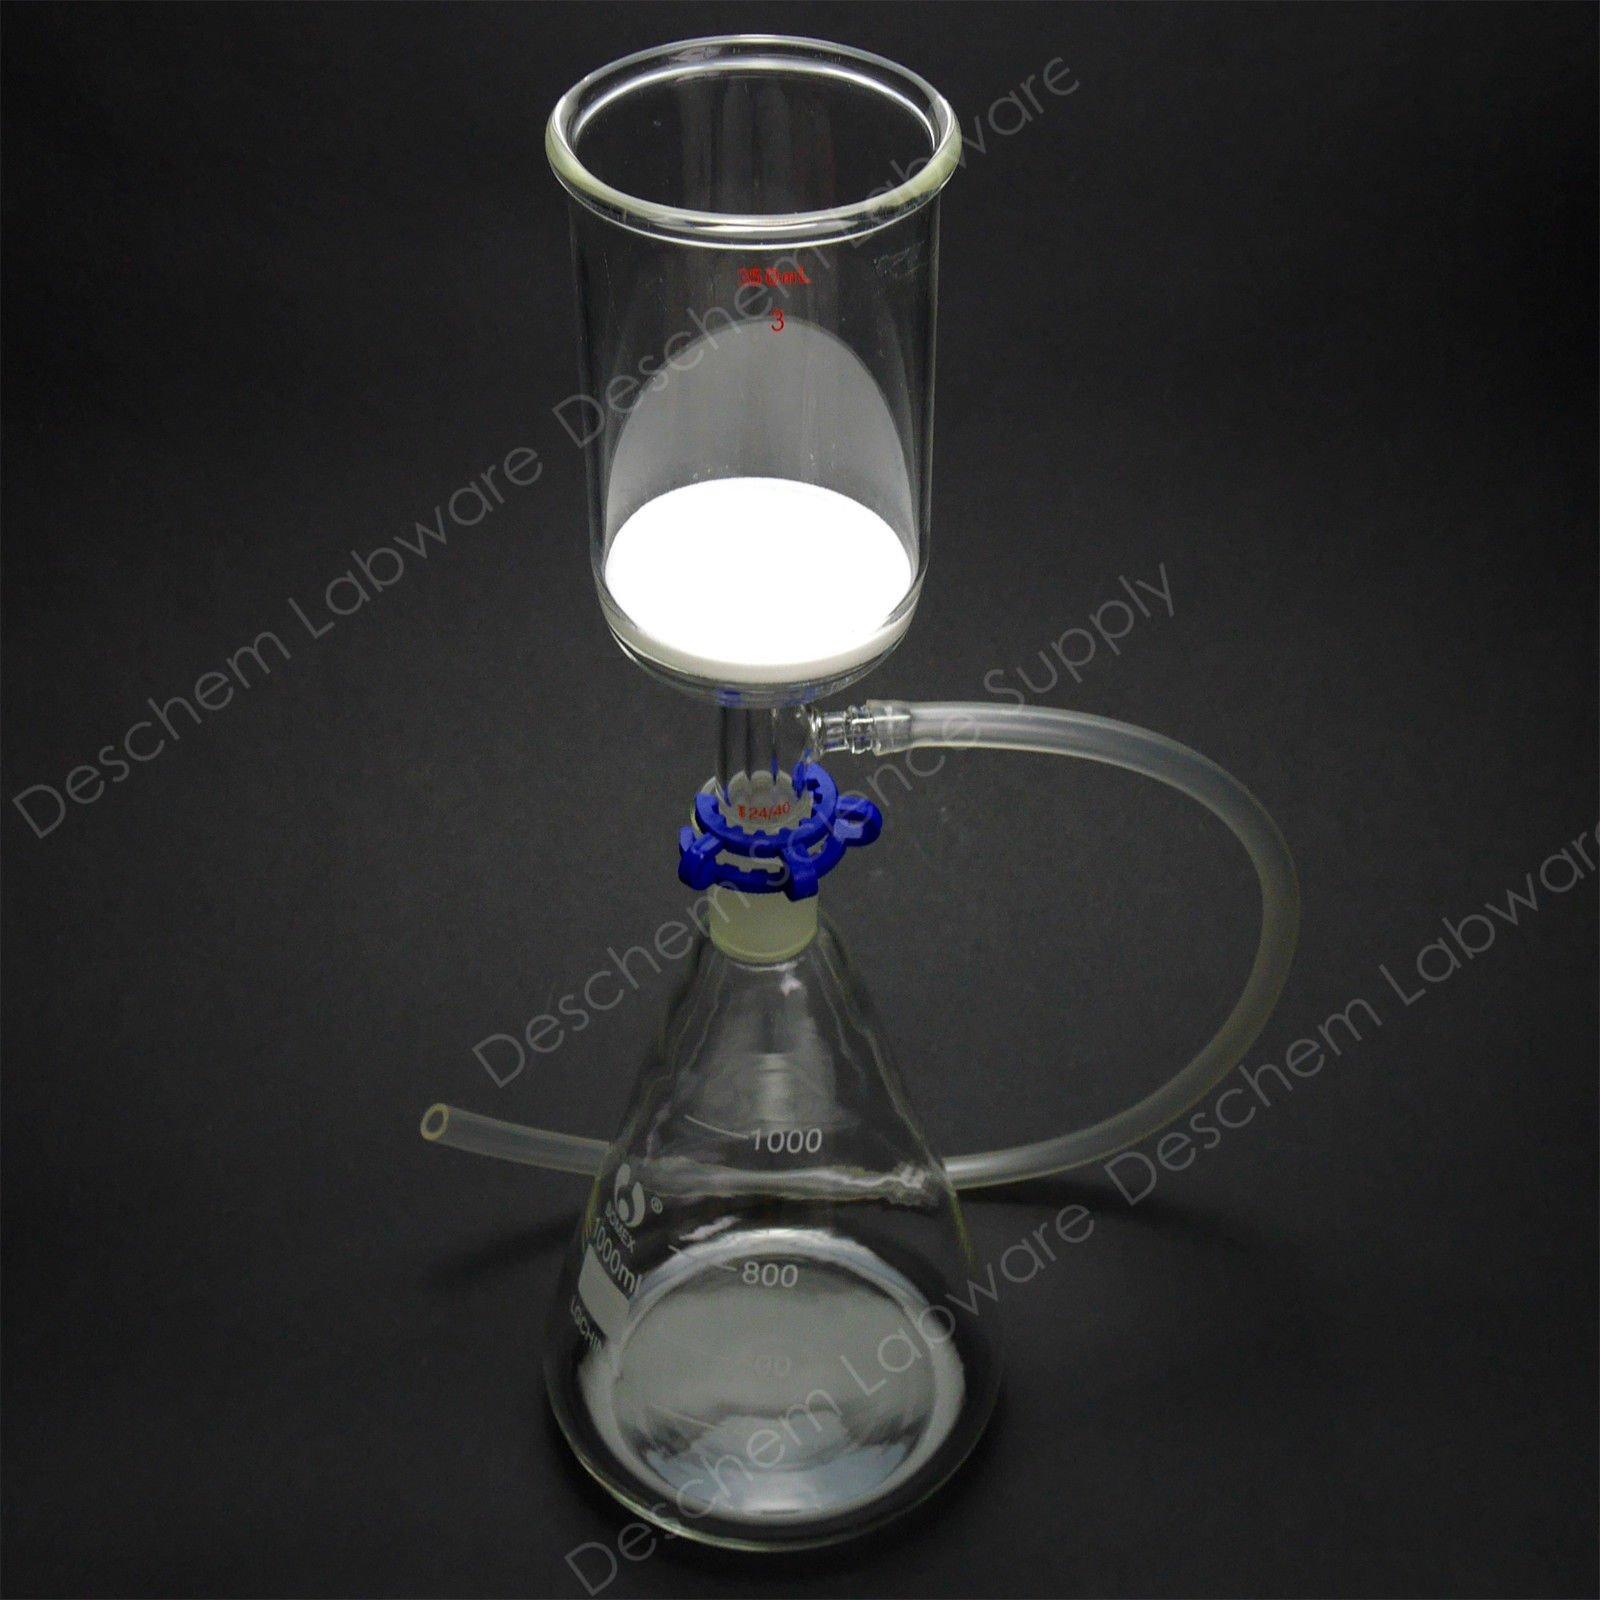 Deschem 1000ml,Glass Suction Filter Kit,350ml 24/40 Buchner Funnel & 1L Erlenmeyer Flask